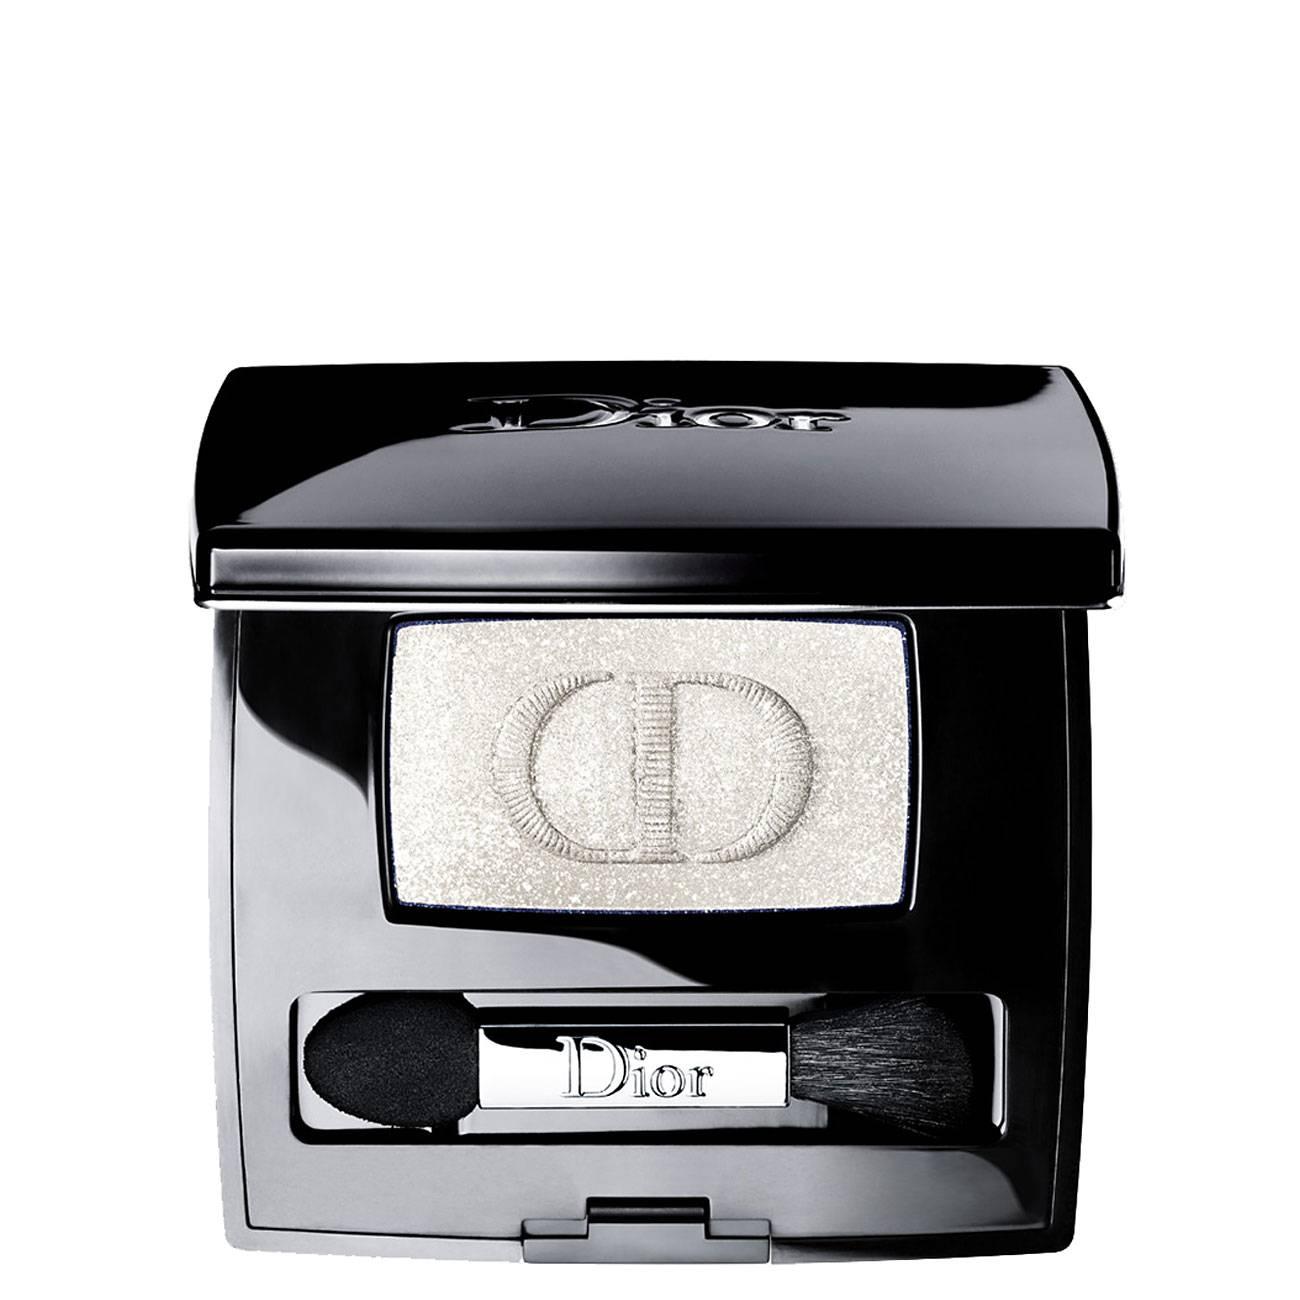 DIORSHOW FUSION MONO - 2 gr 006-Infinity imagine produs